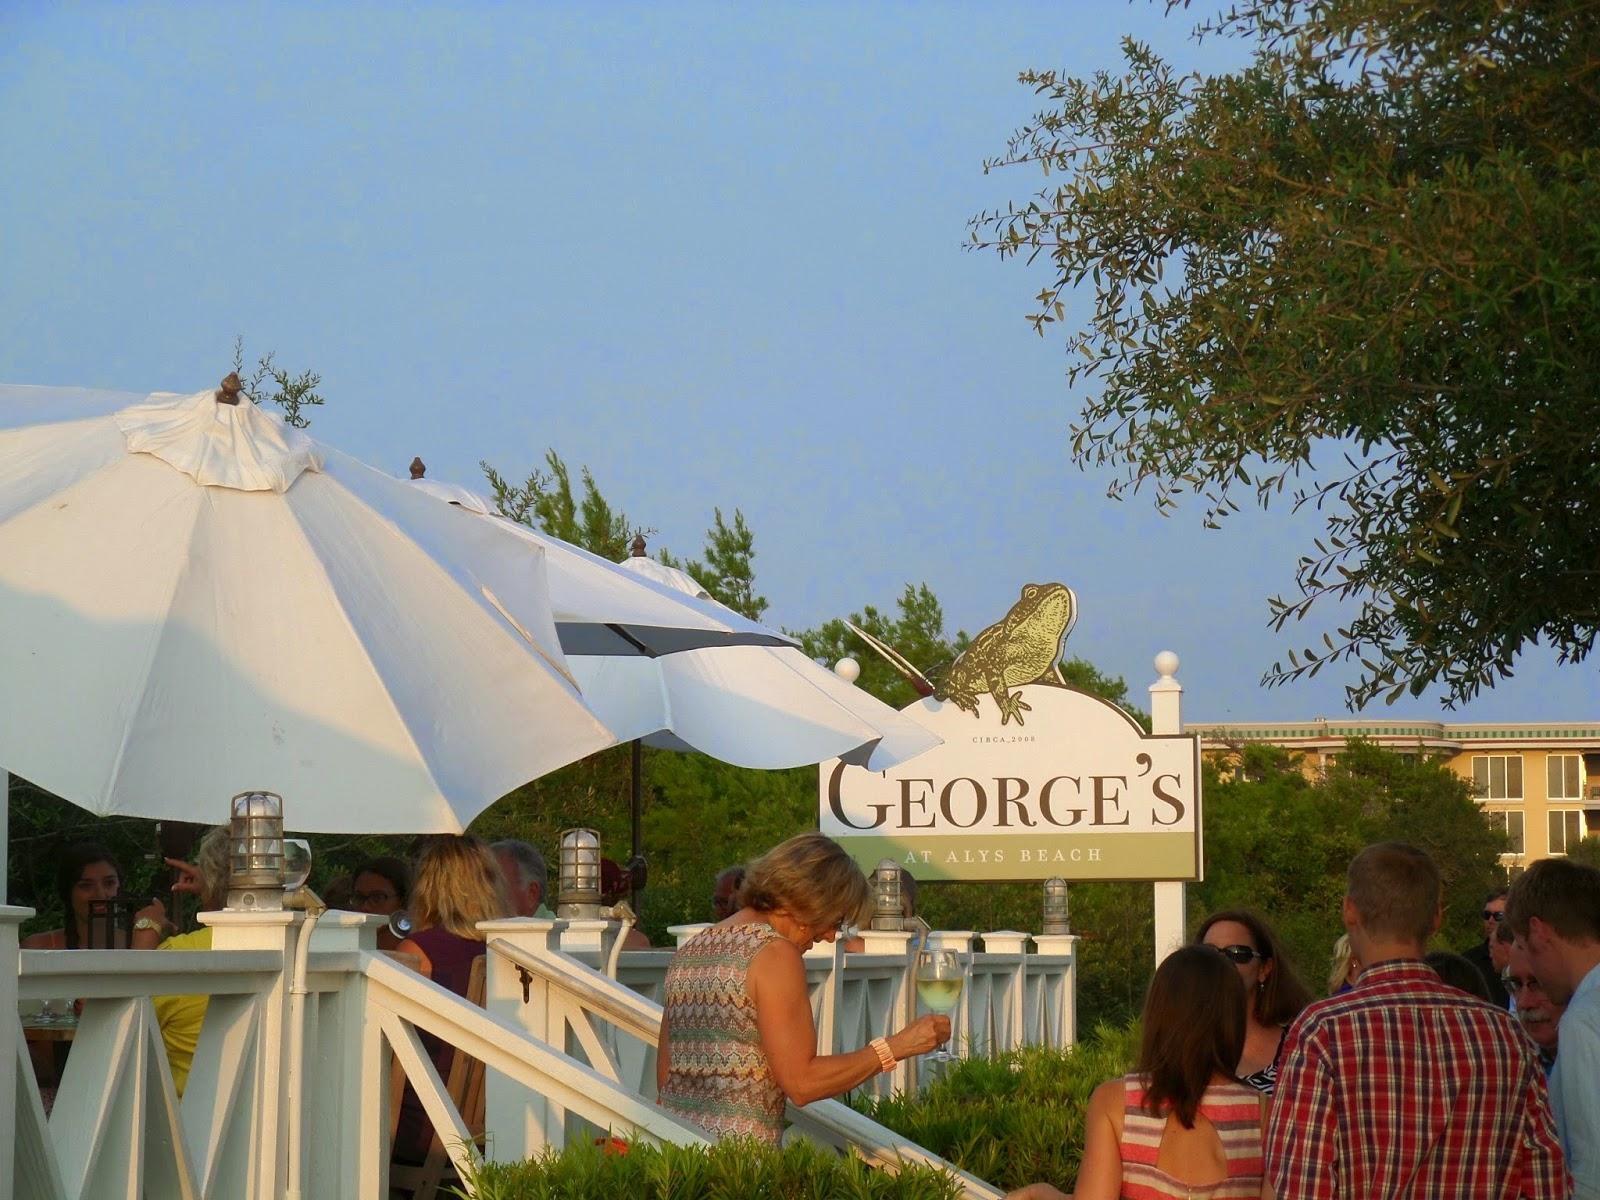 george's alys beach, alys beach florida